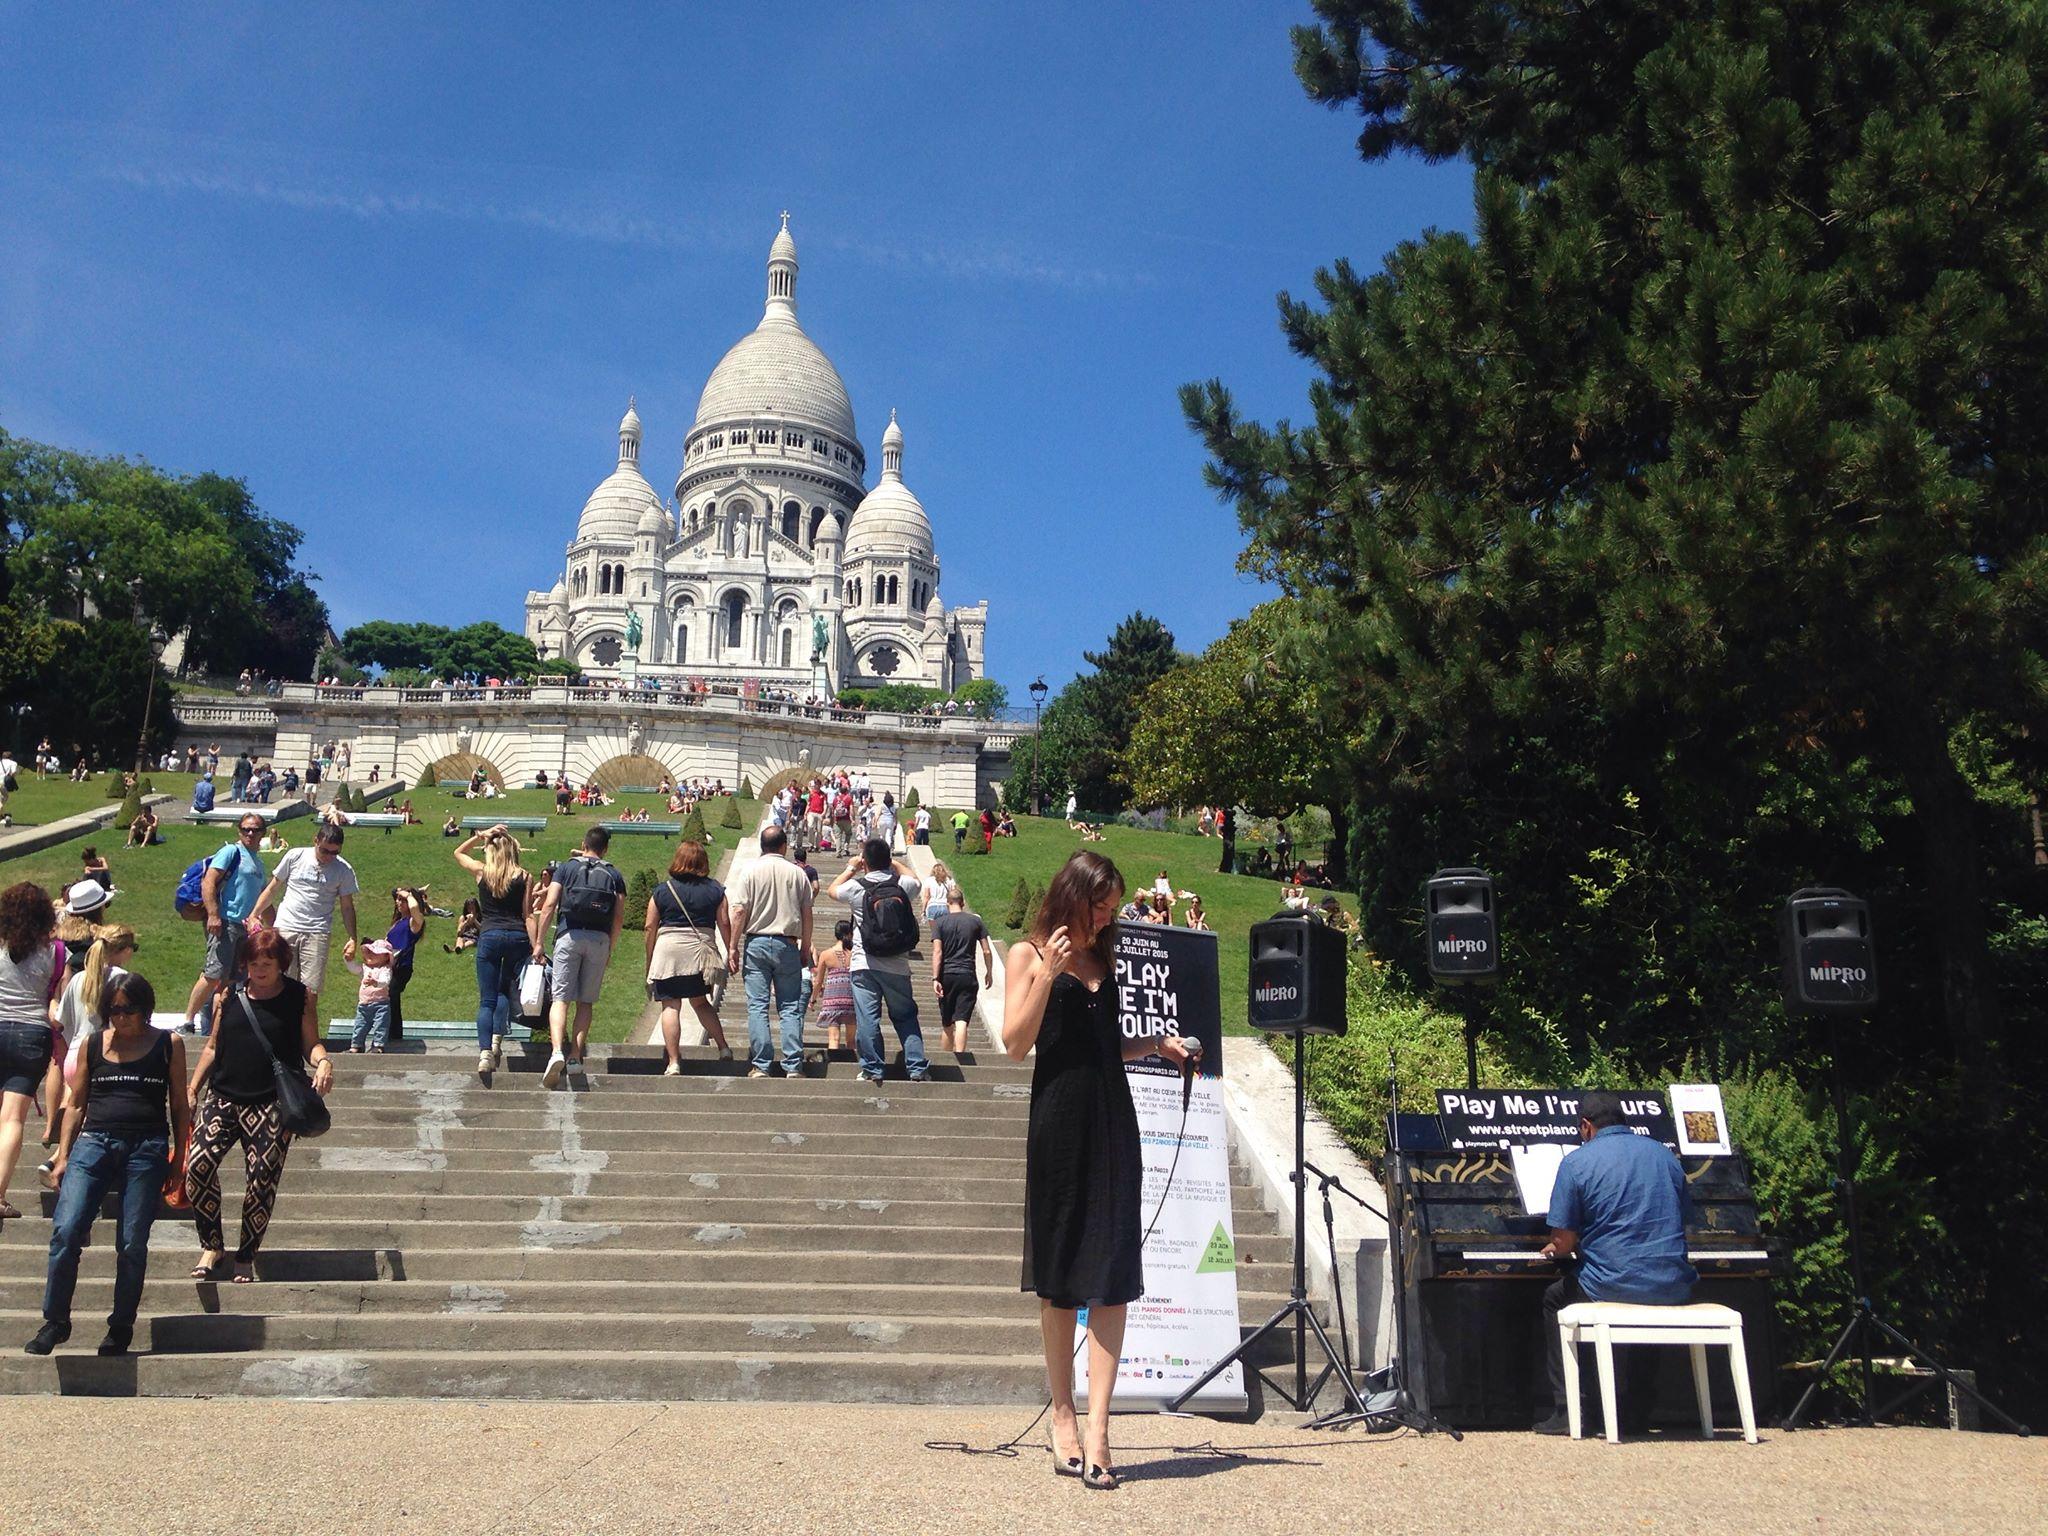 Play Me I'm Yours, des concerts gratuits de piano dans les rues de Paris (+vidéo)